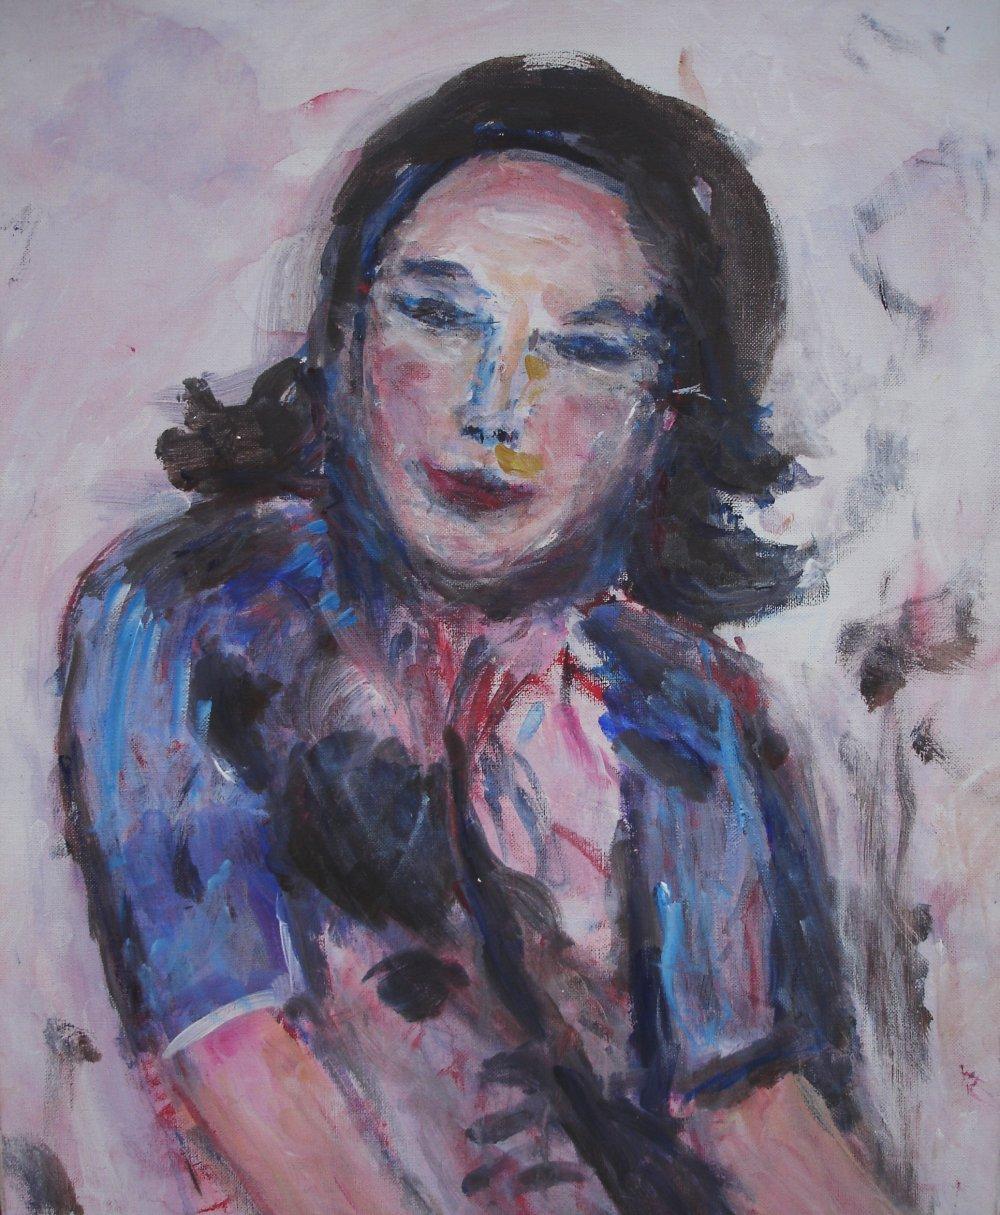 Mademoiselle - acrylique